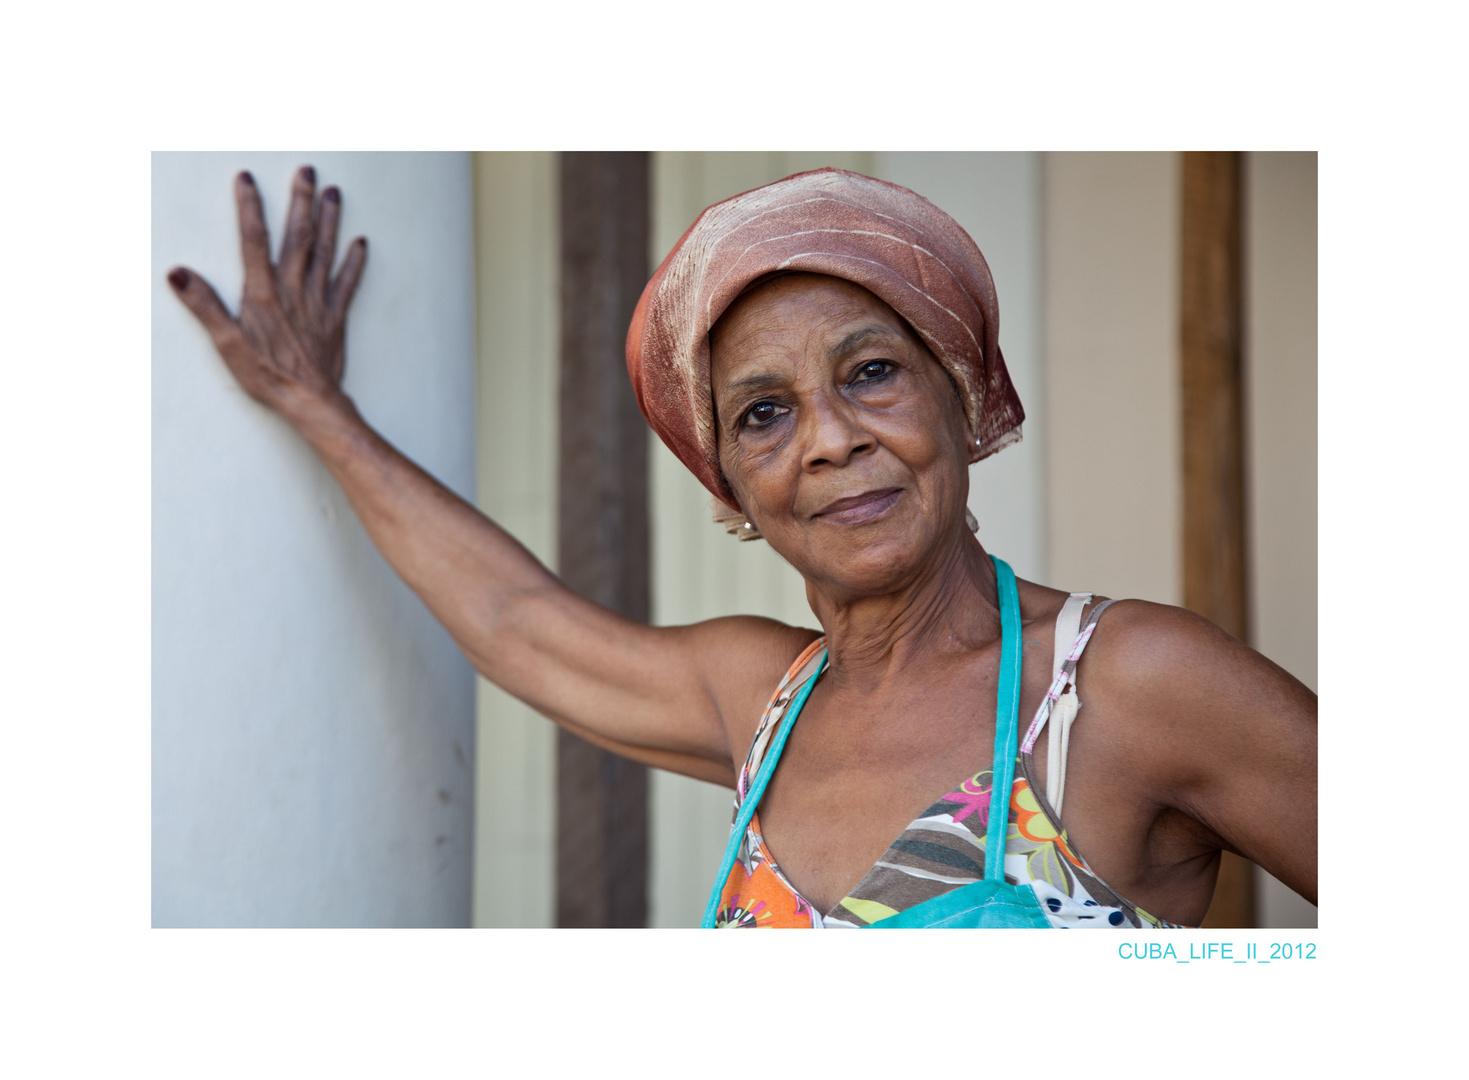 CUBA_LIFE_II